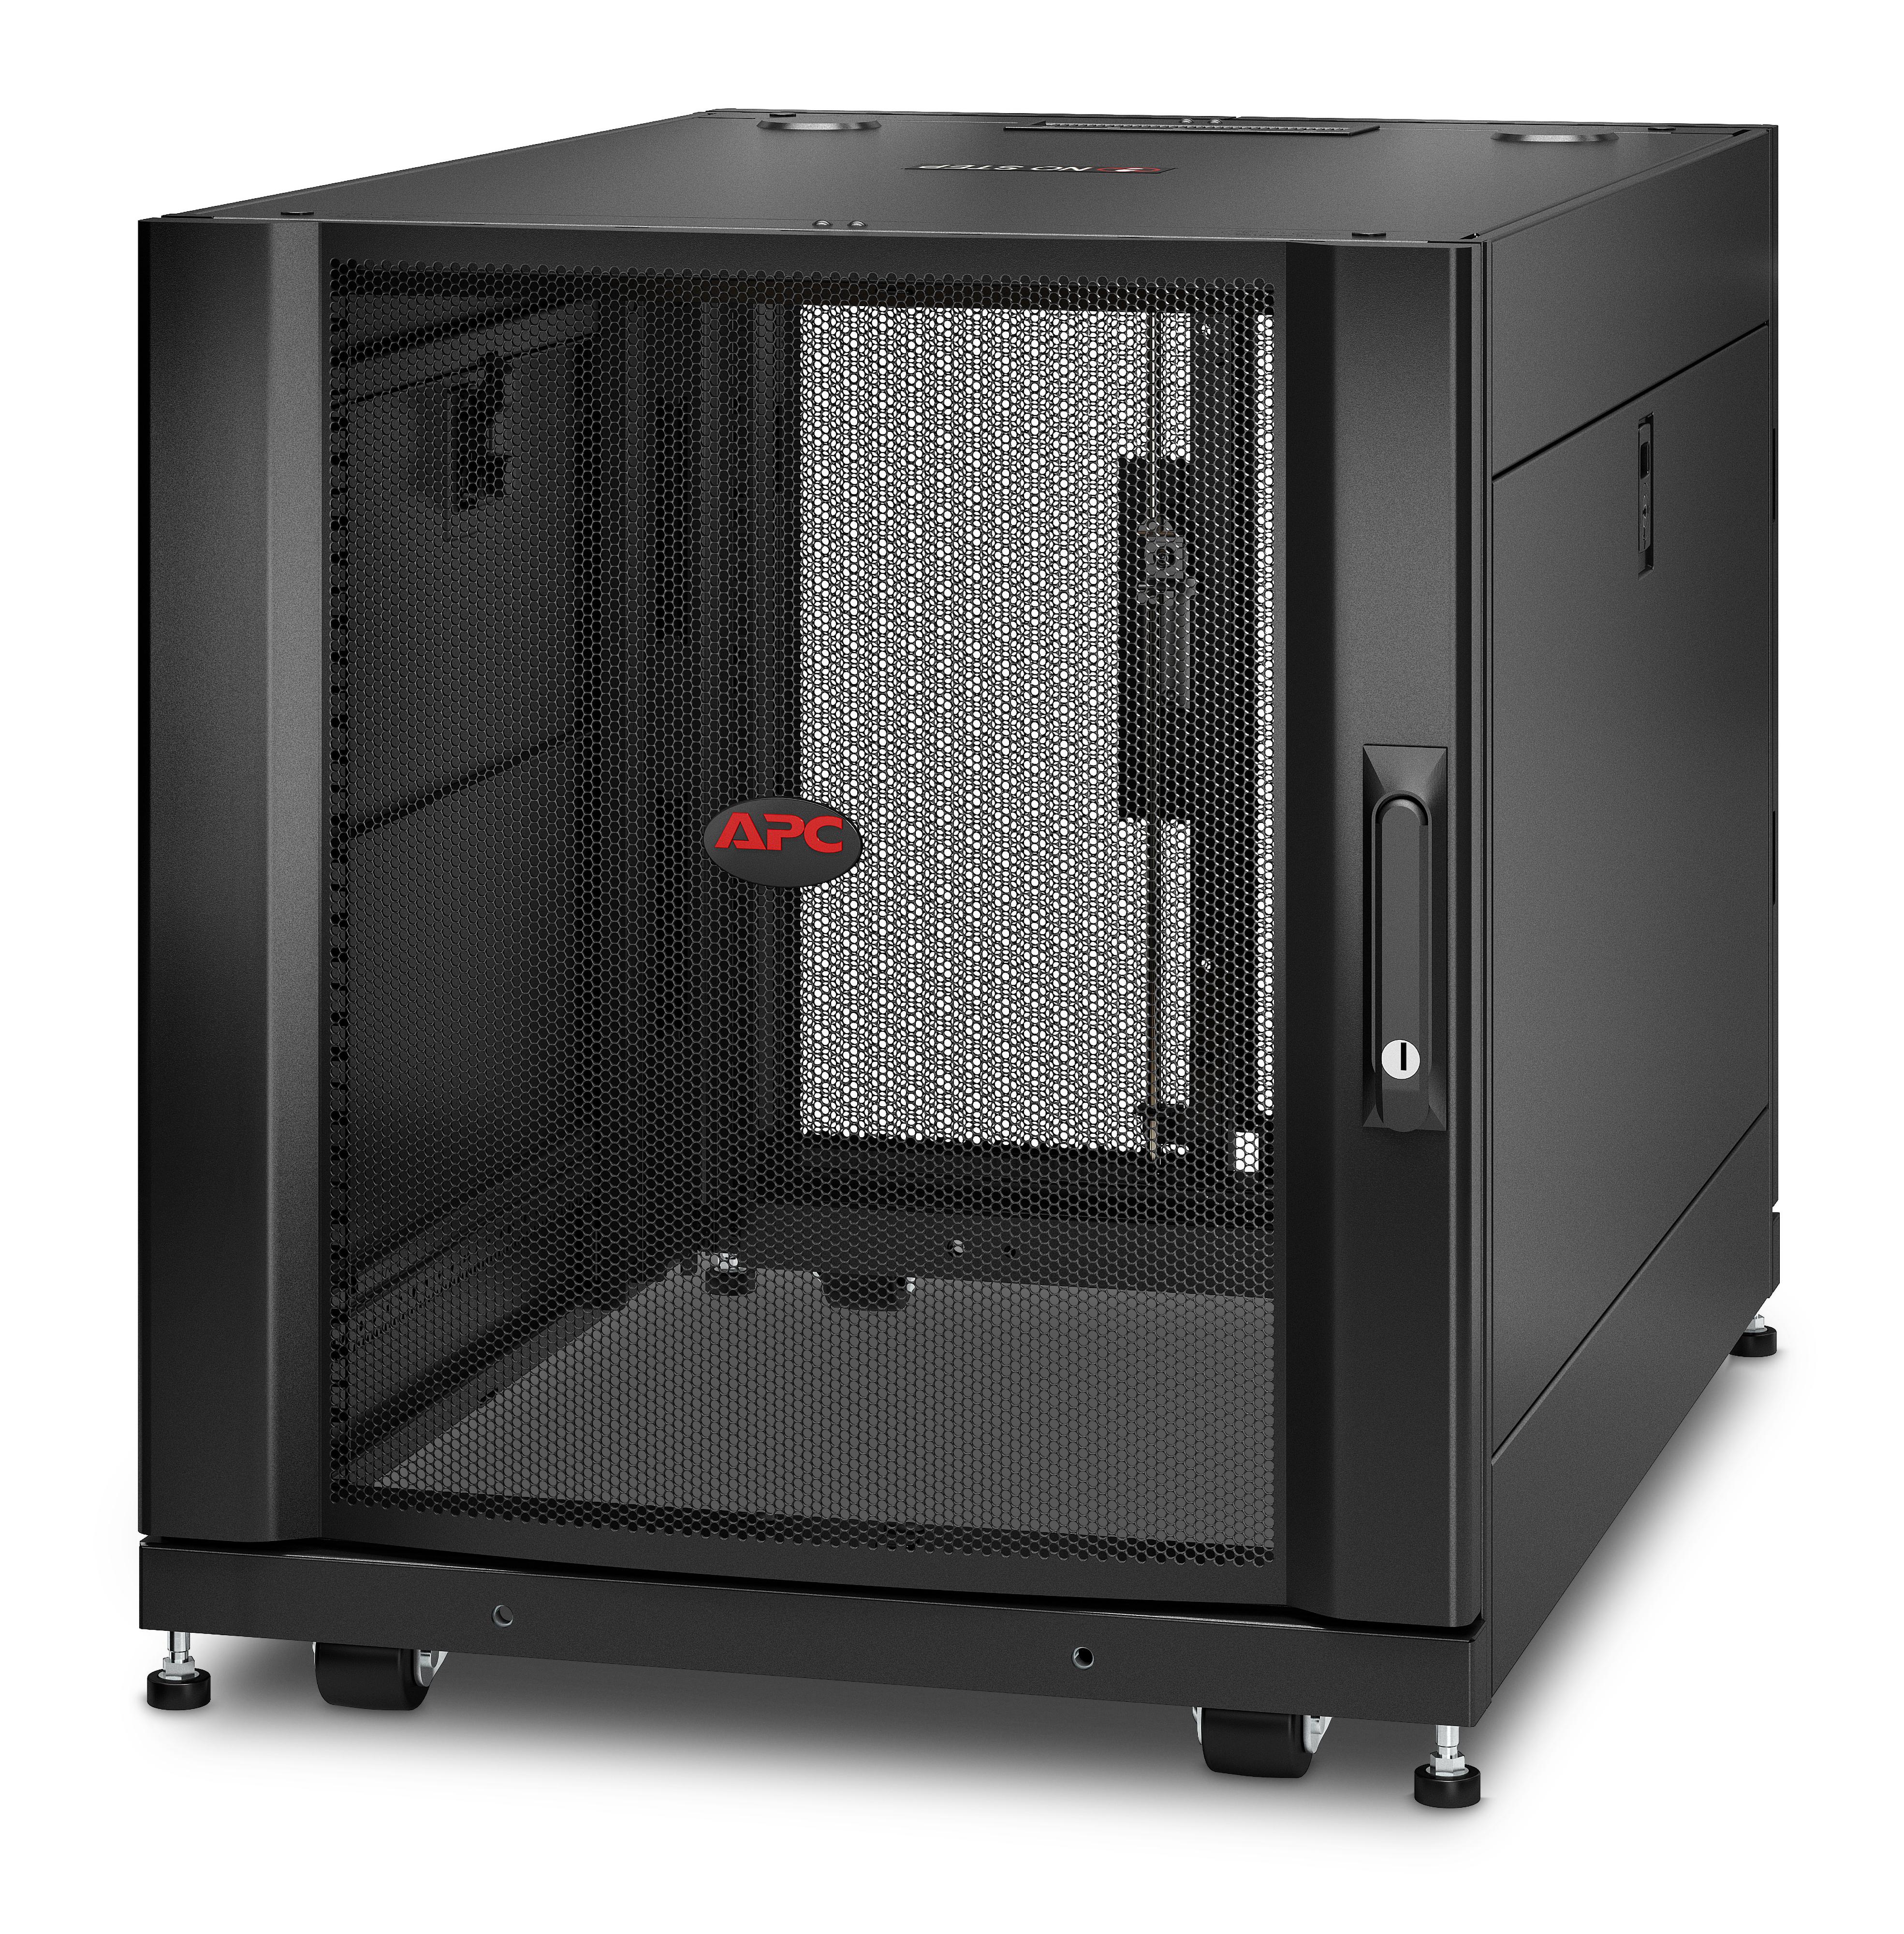 APC NetShelter SX - 12U - Freistehendes Gestell - 272 kg - Schwarz - IP20 - UL 2416 - UL 60950-1 - REACH